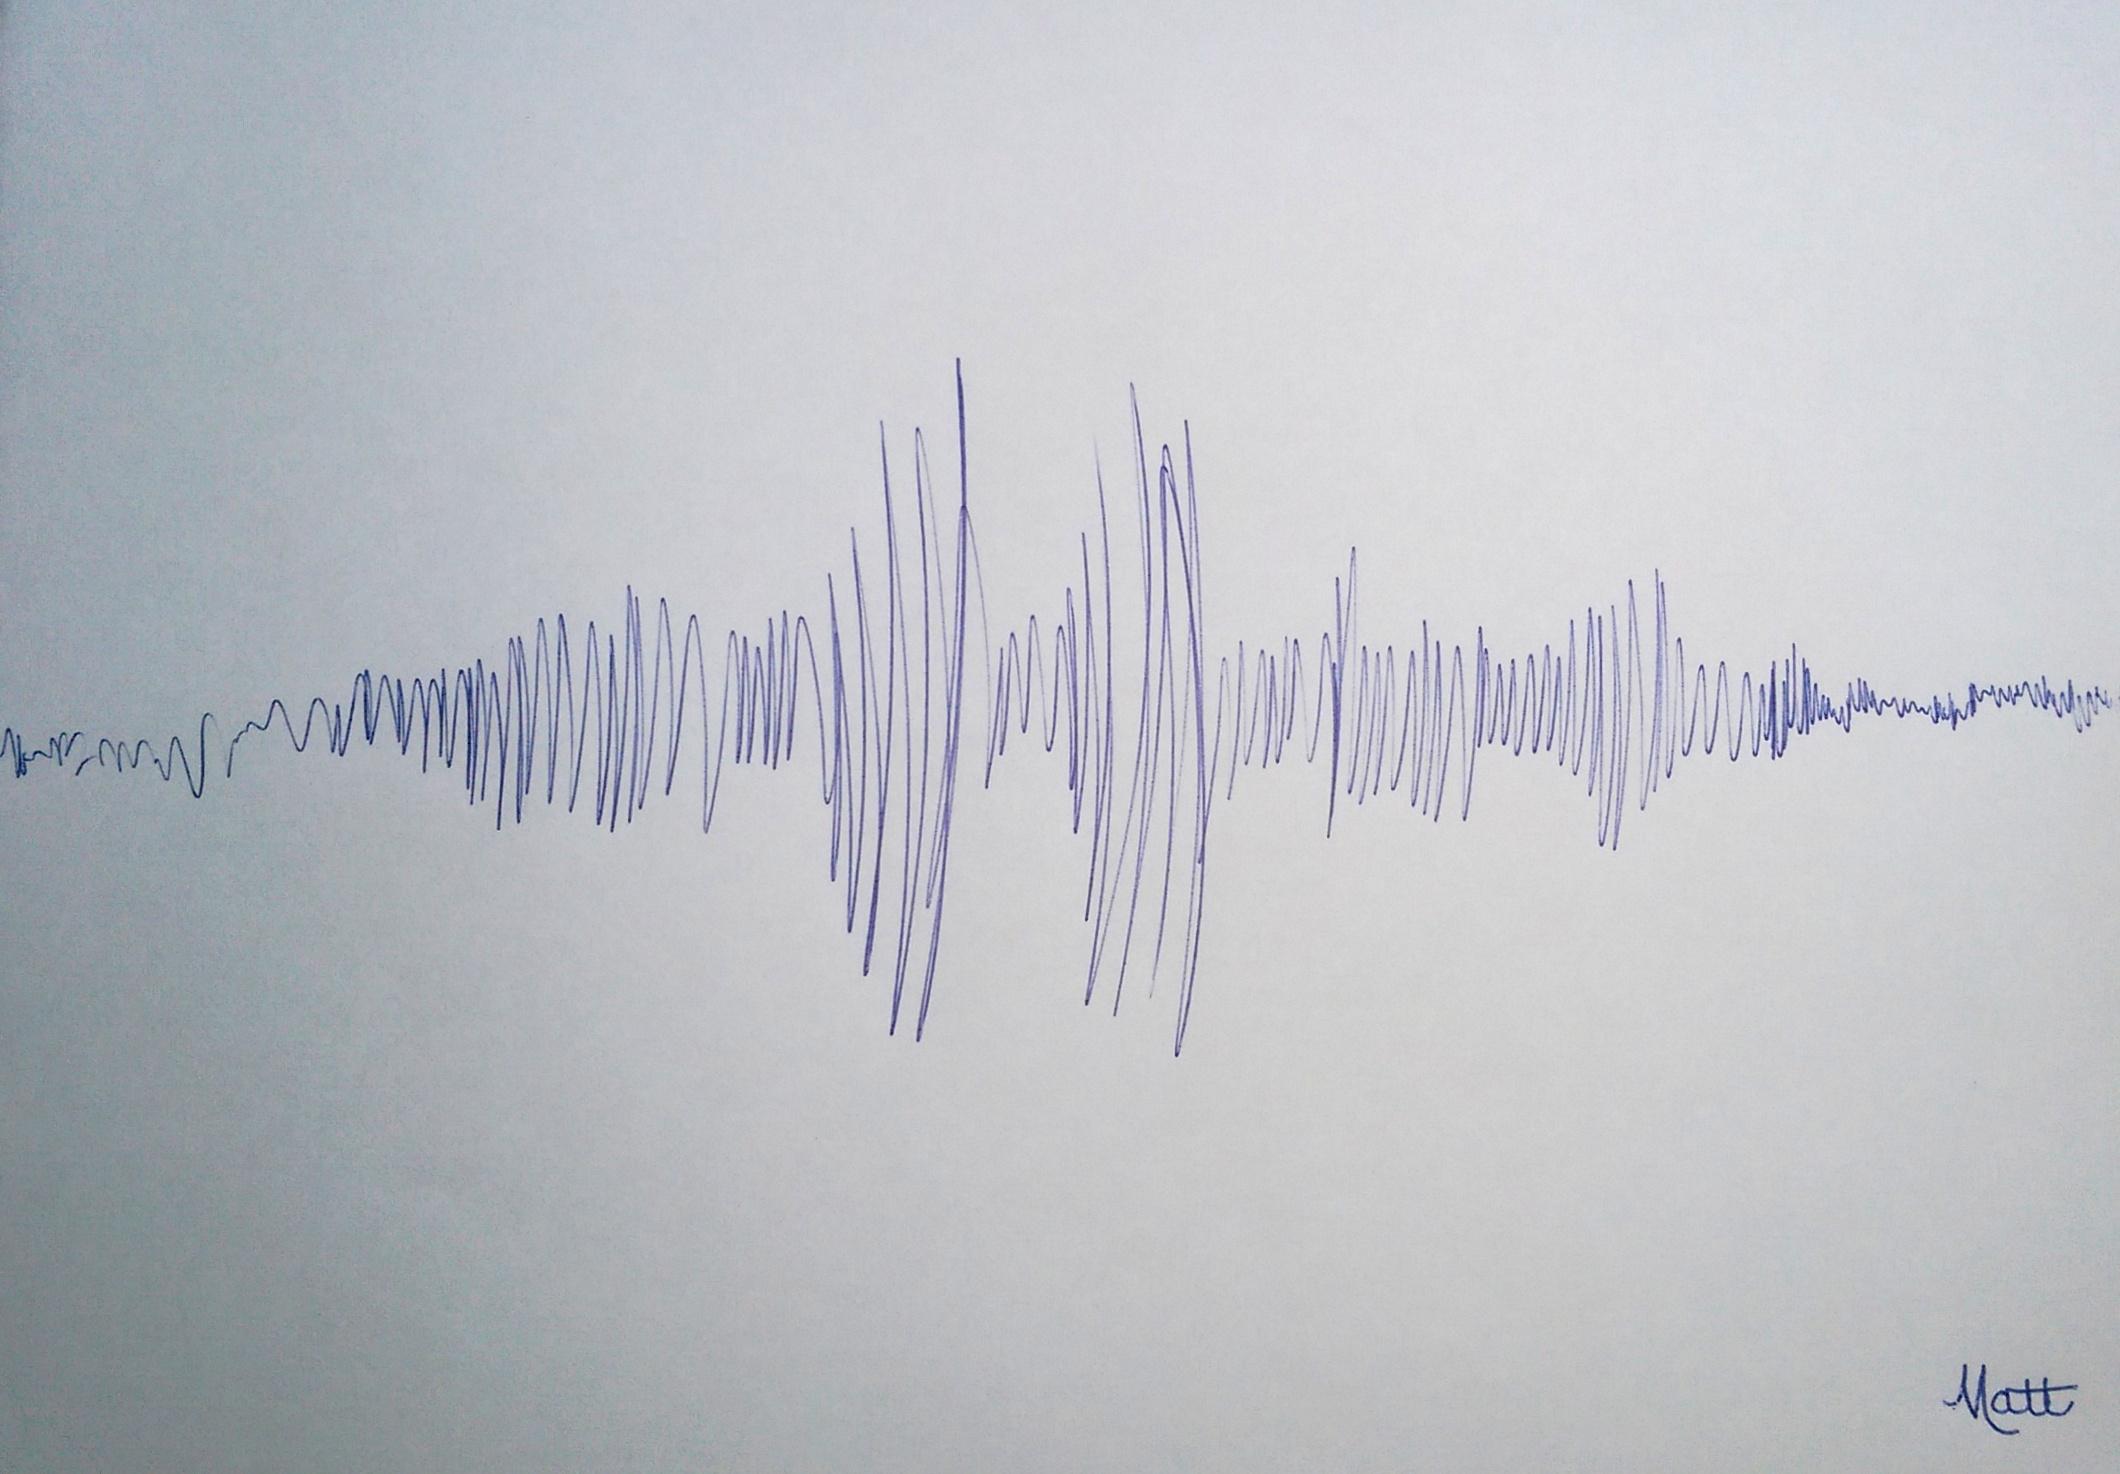 2120x1474 Sound Waves Art The Unfathomable Artist